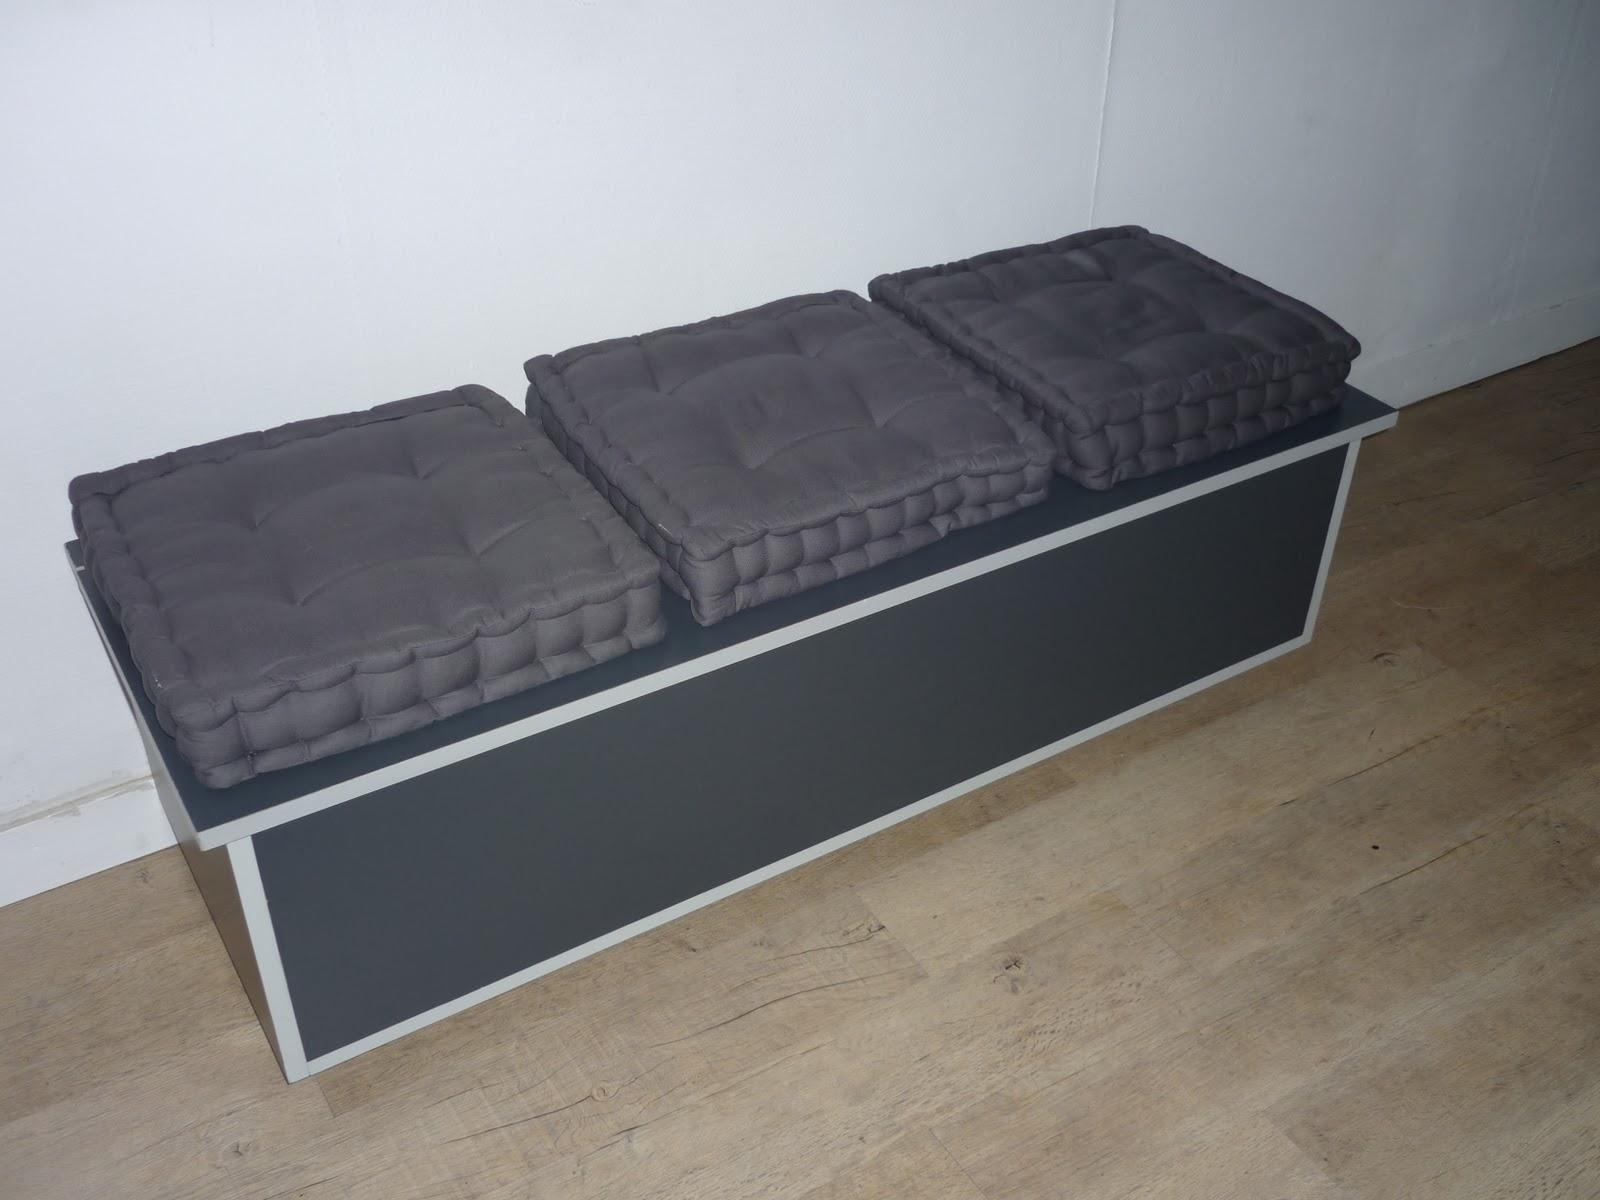 meublantbois meuble en bois meublant bois. Black Bedroom Furniture Sets. Home Design Ideas